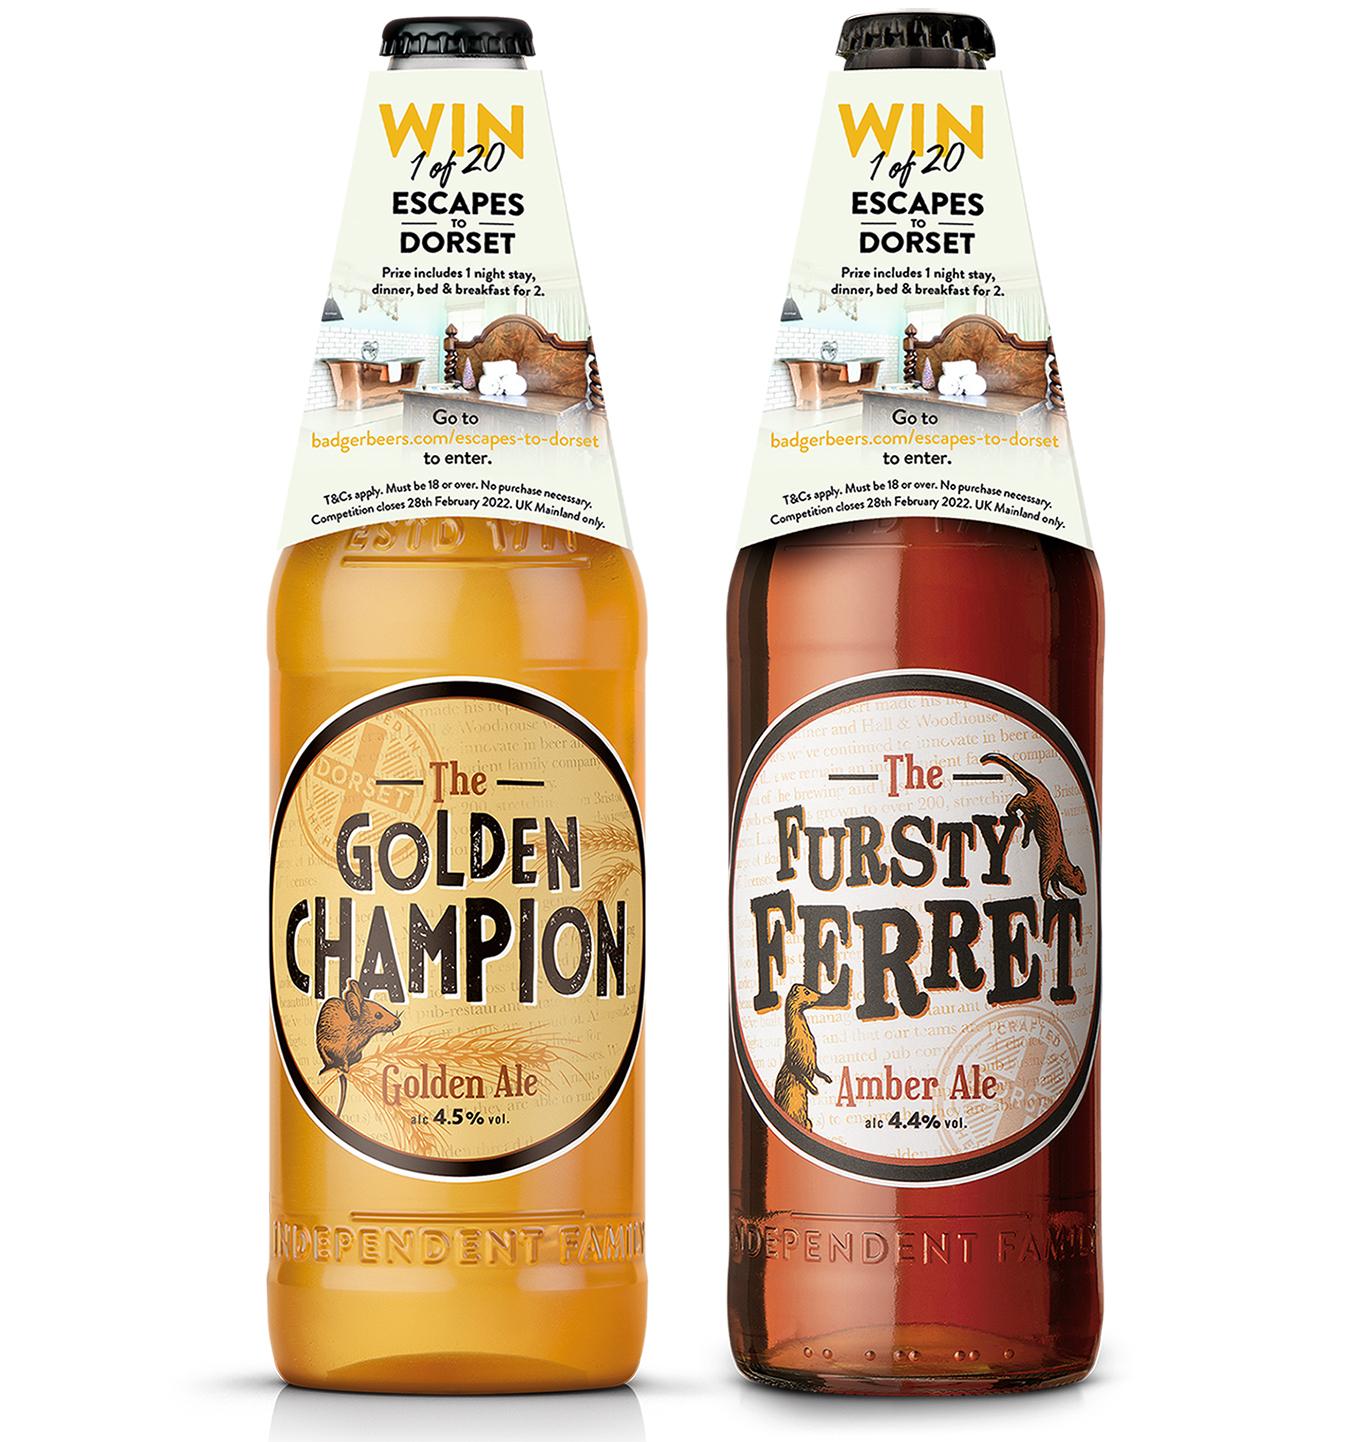 Badger Beer bottle shots: Ale brand badger beers offers Dorset staycations in on-pack promotion